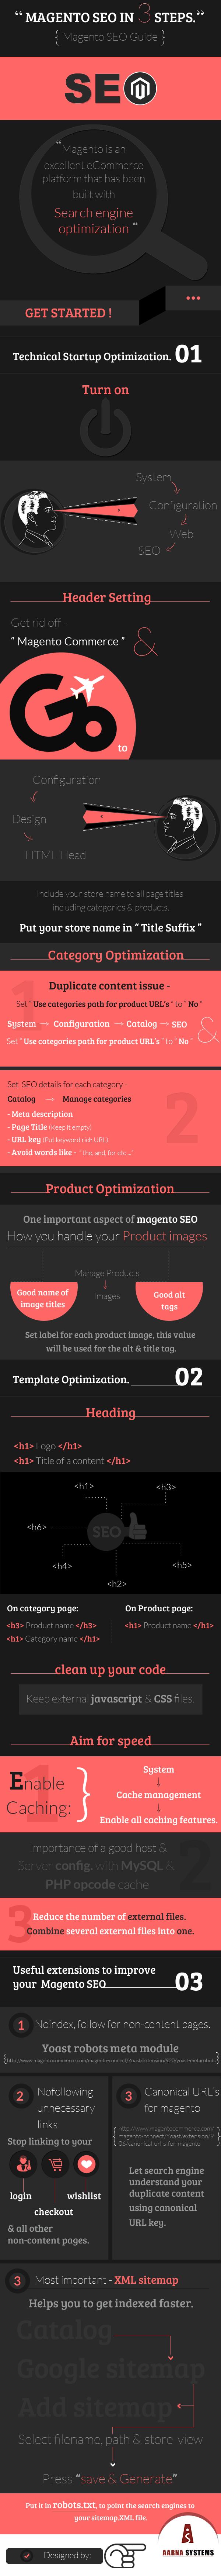 magento-seo-infographics